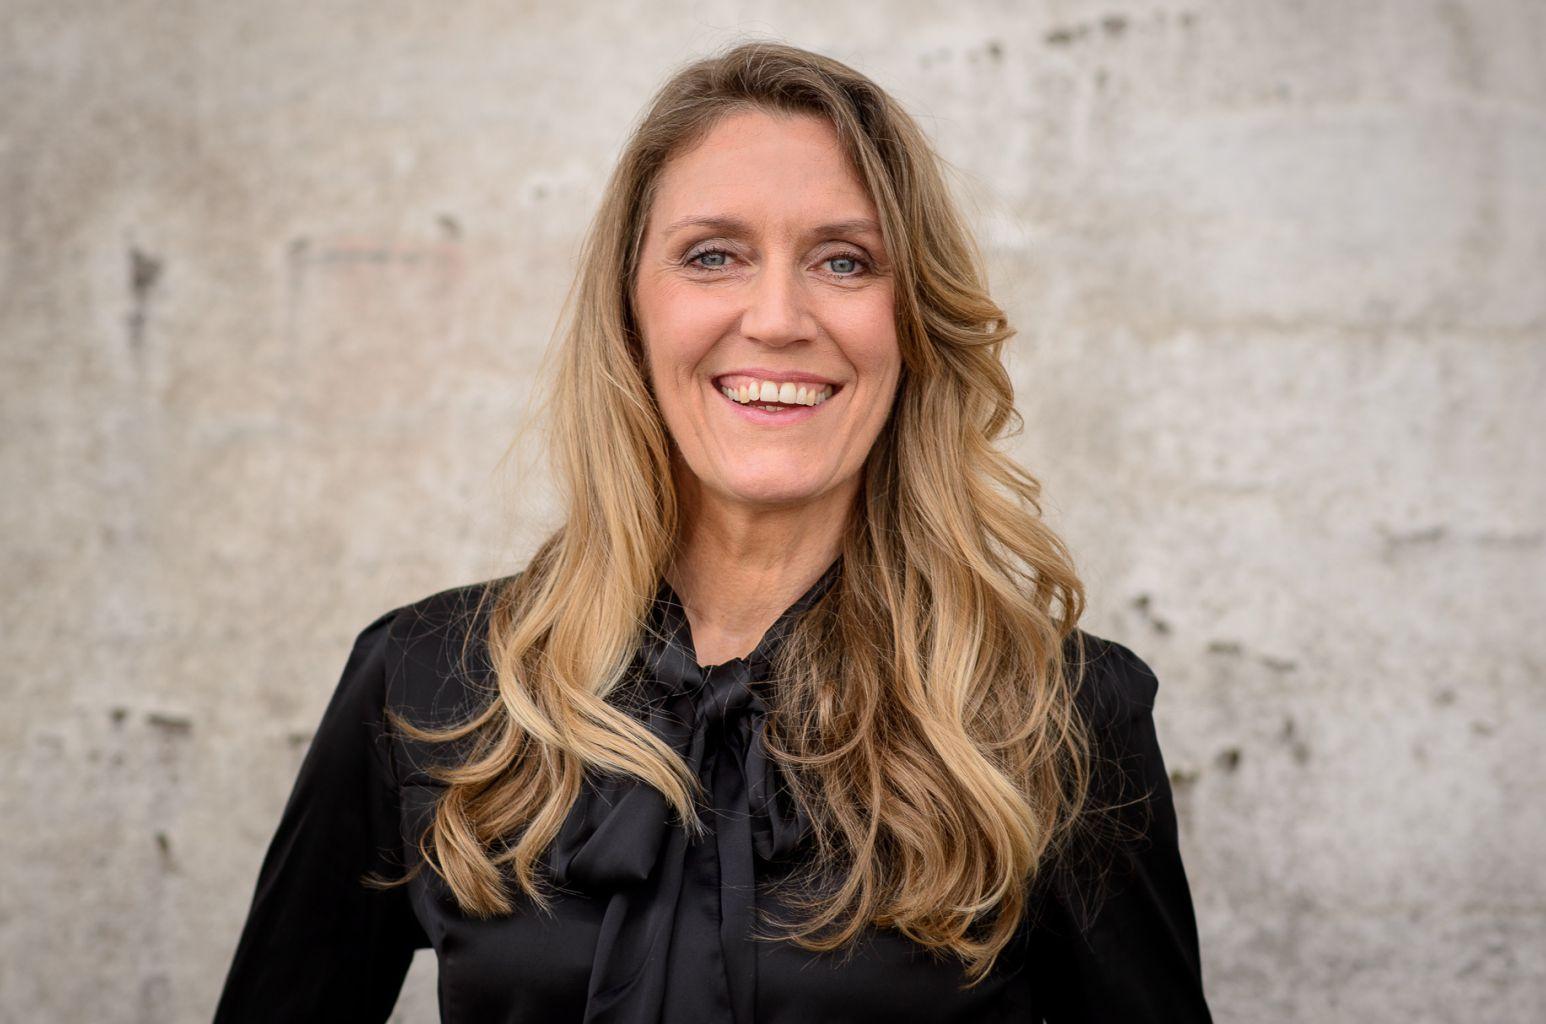 Mieke Langenhuizen, Social Monday